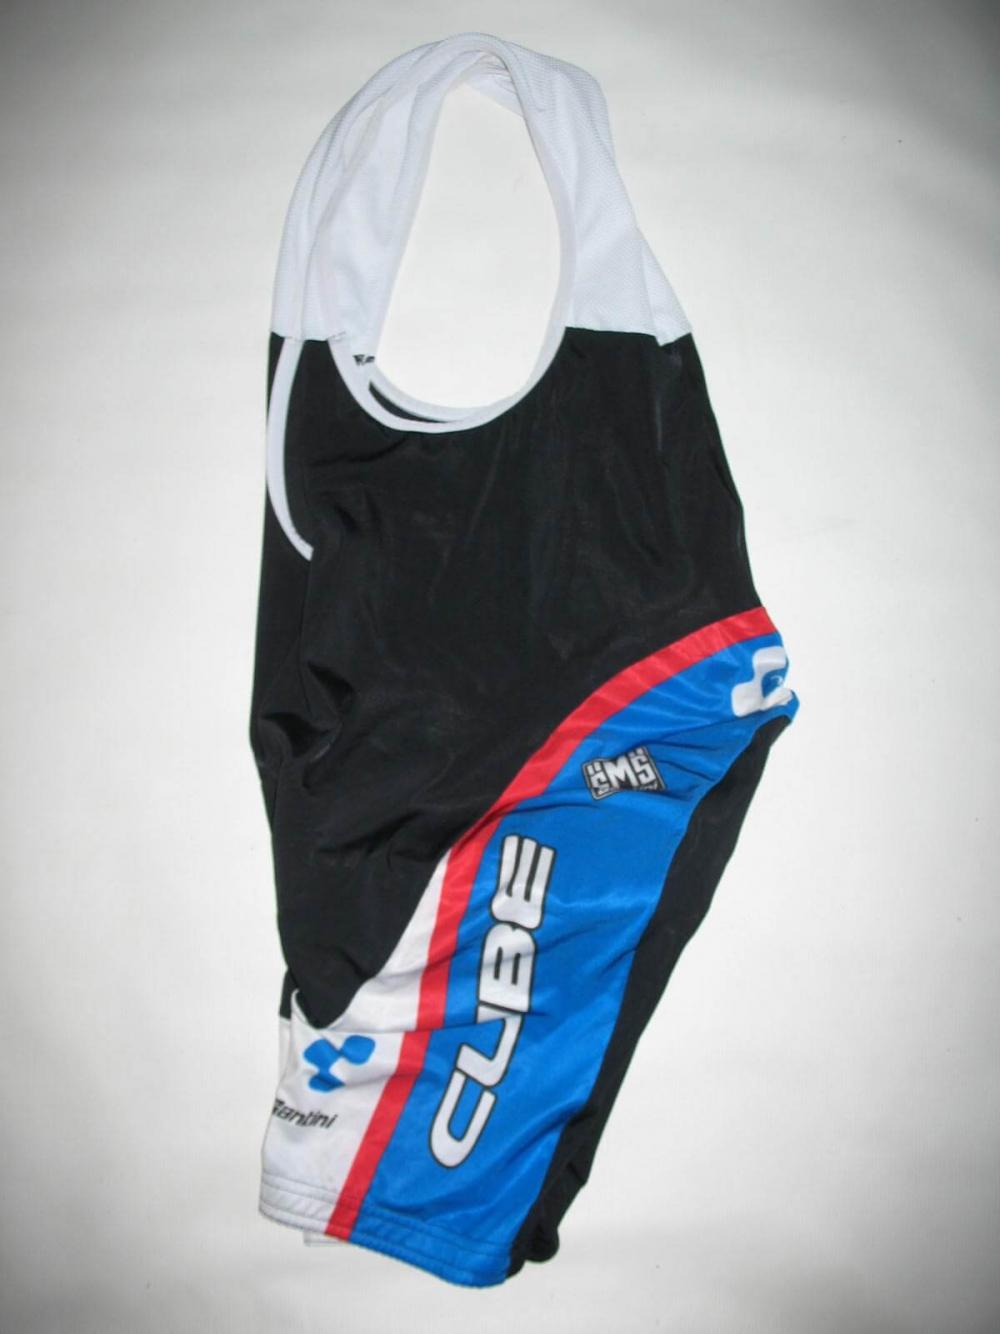 Велошорты SMS SANTINI cube bib shorts (размер 44-46/M-S) - 2